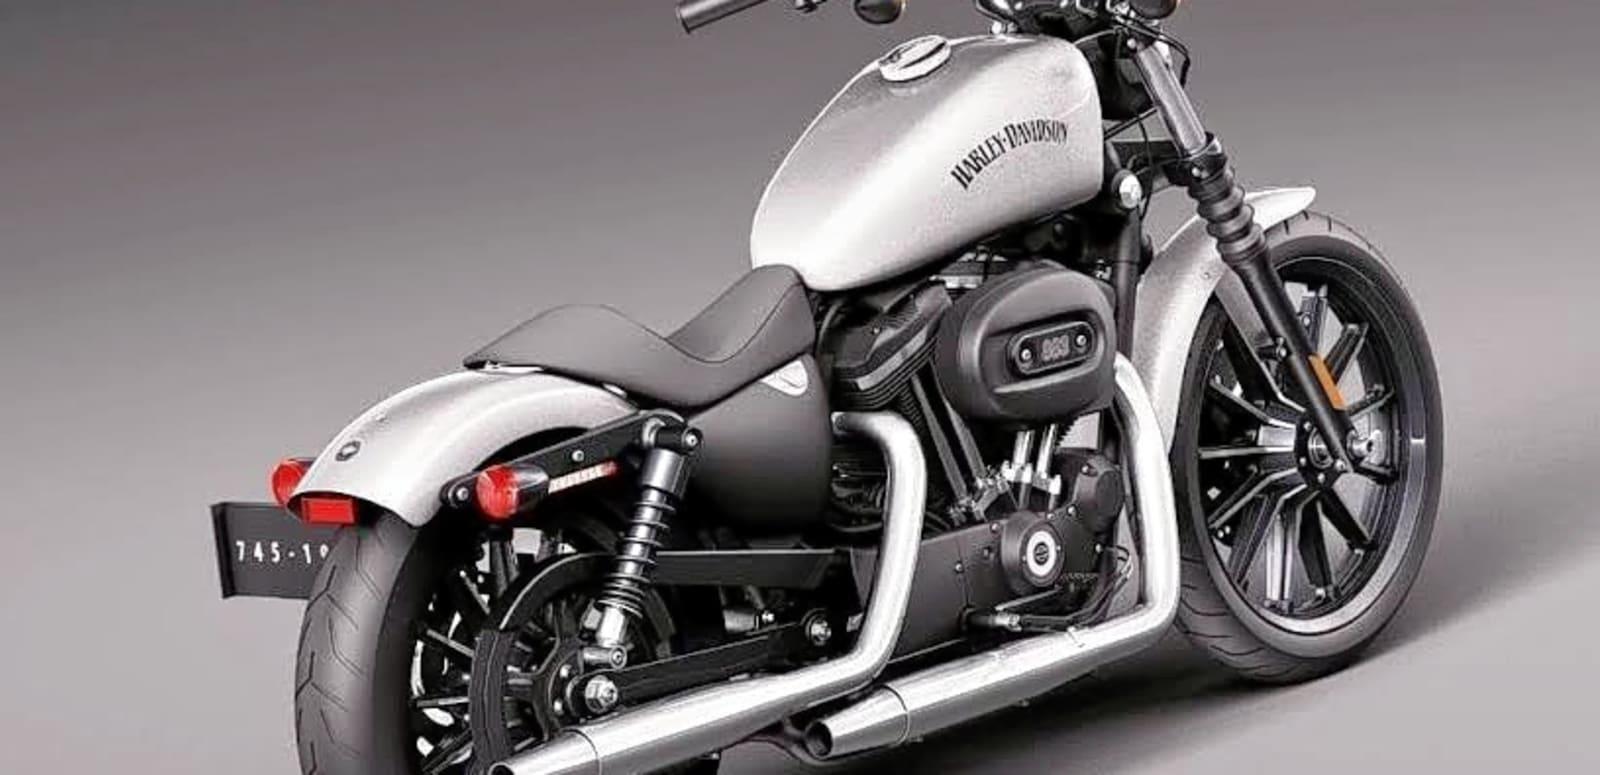 Harley Davidson Iron 833 >> Rent A Harley Davidson Iron 883 In Mumbai Thrillophilia